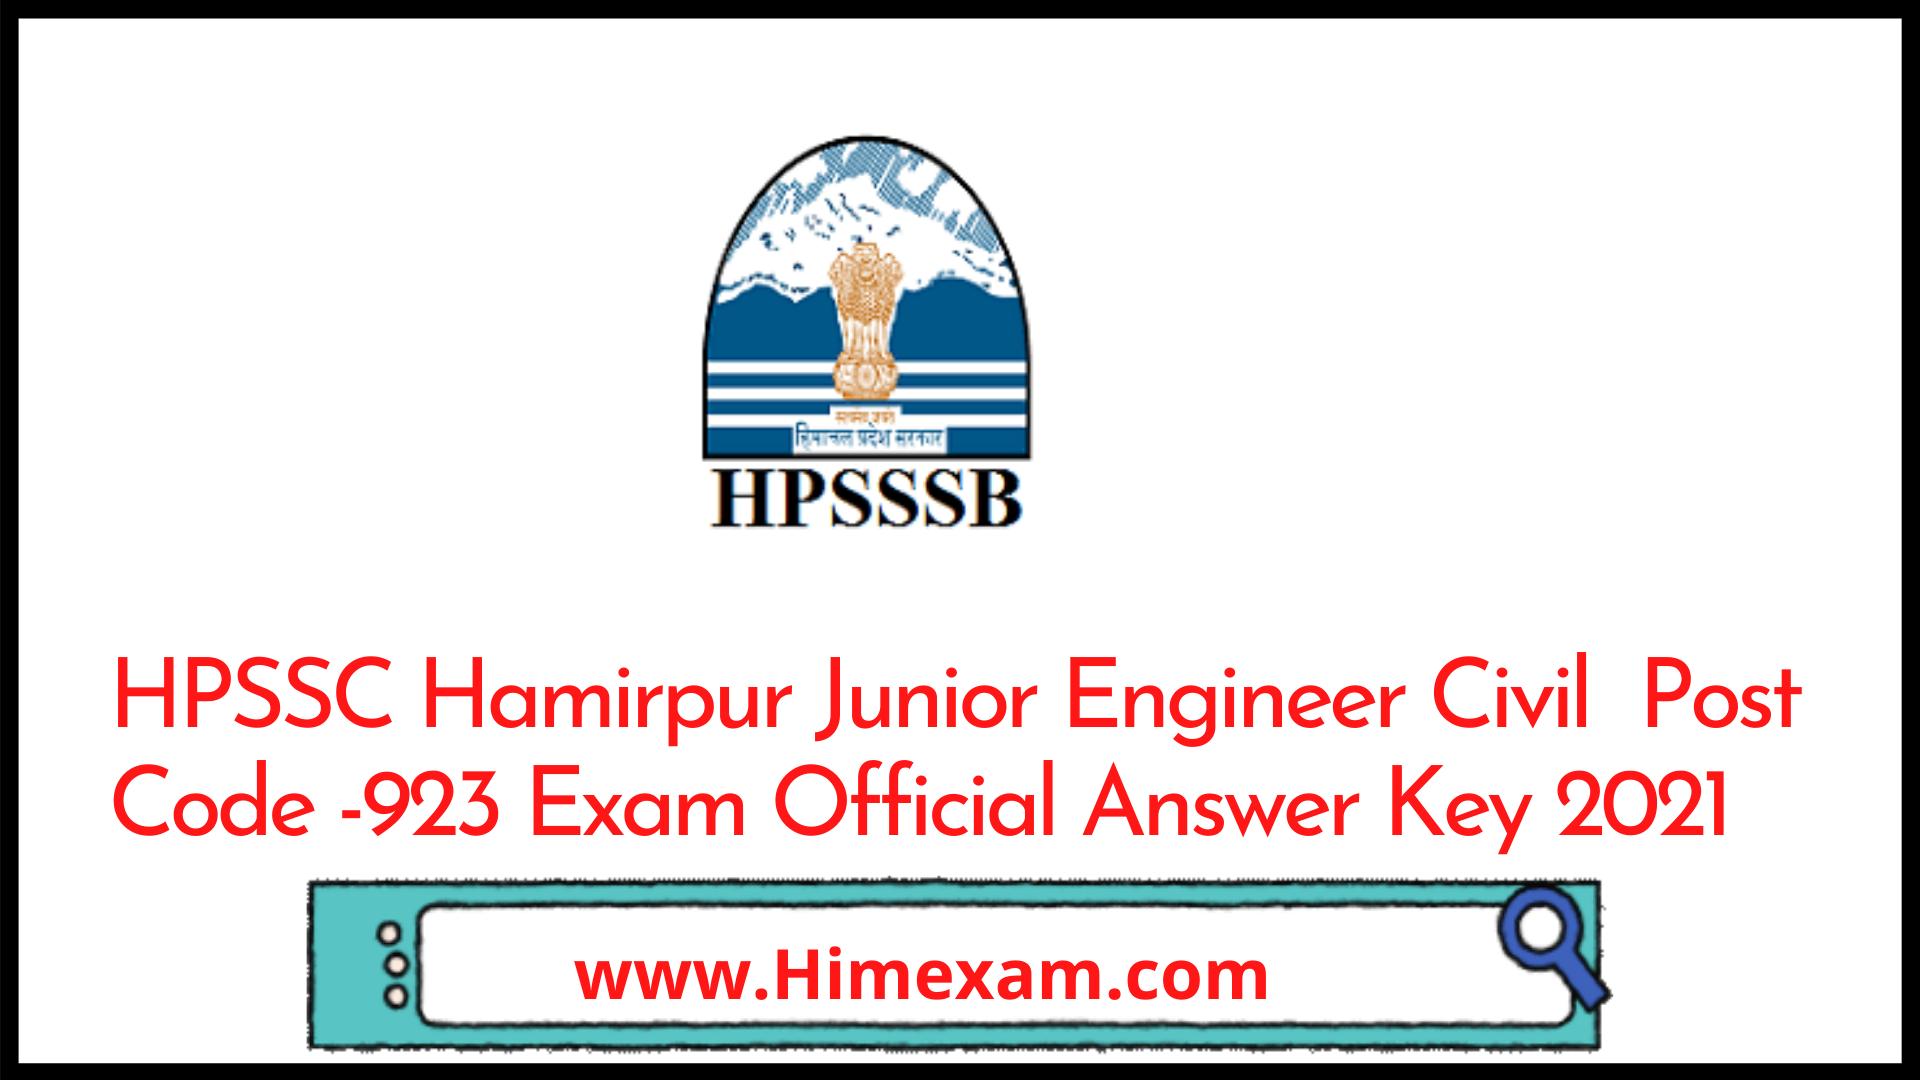 HPSSC Hamirpur Junior Engineer Civil  Post Code -923 Exam Official Answer Key 2021